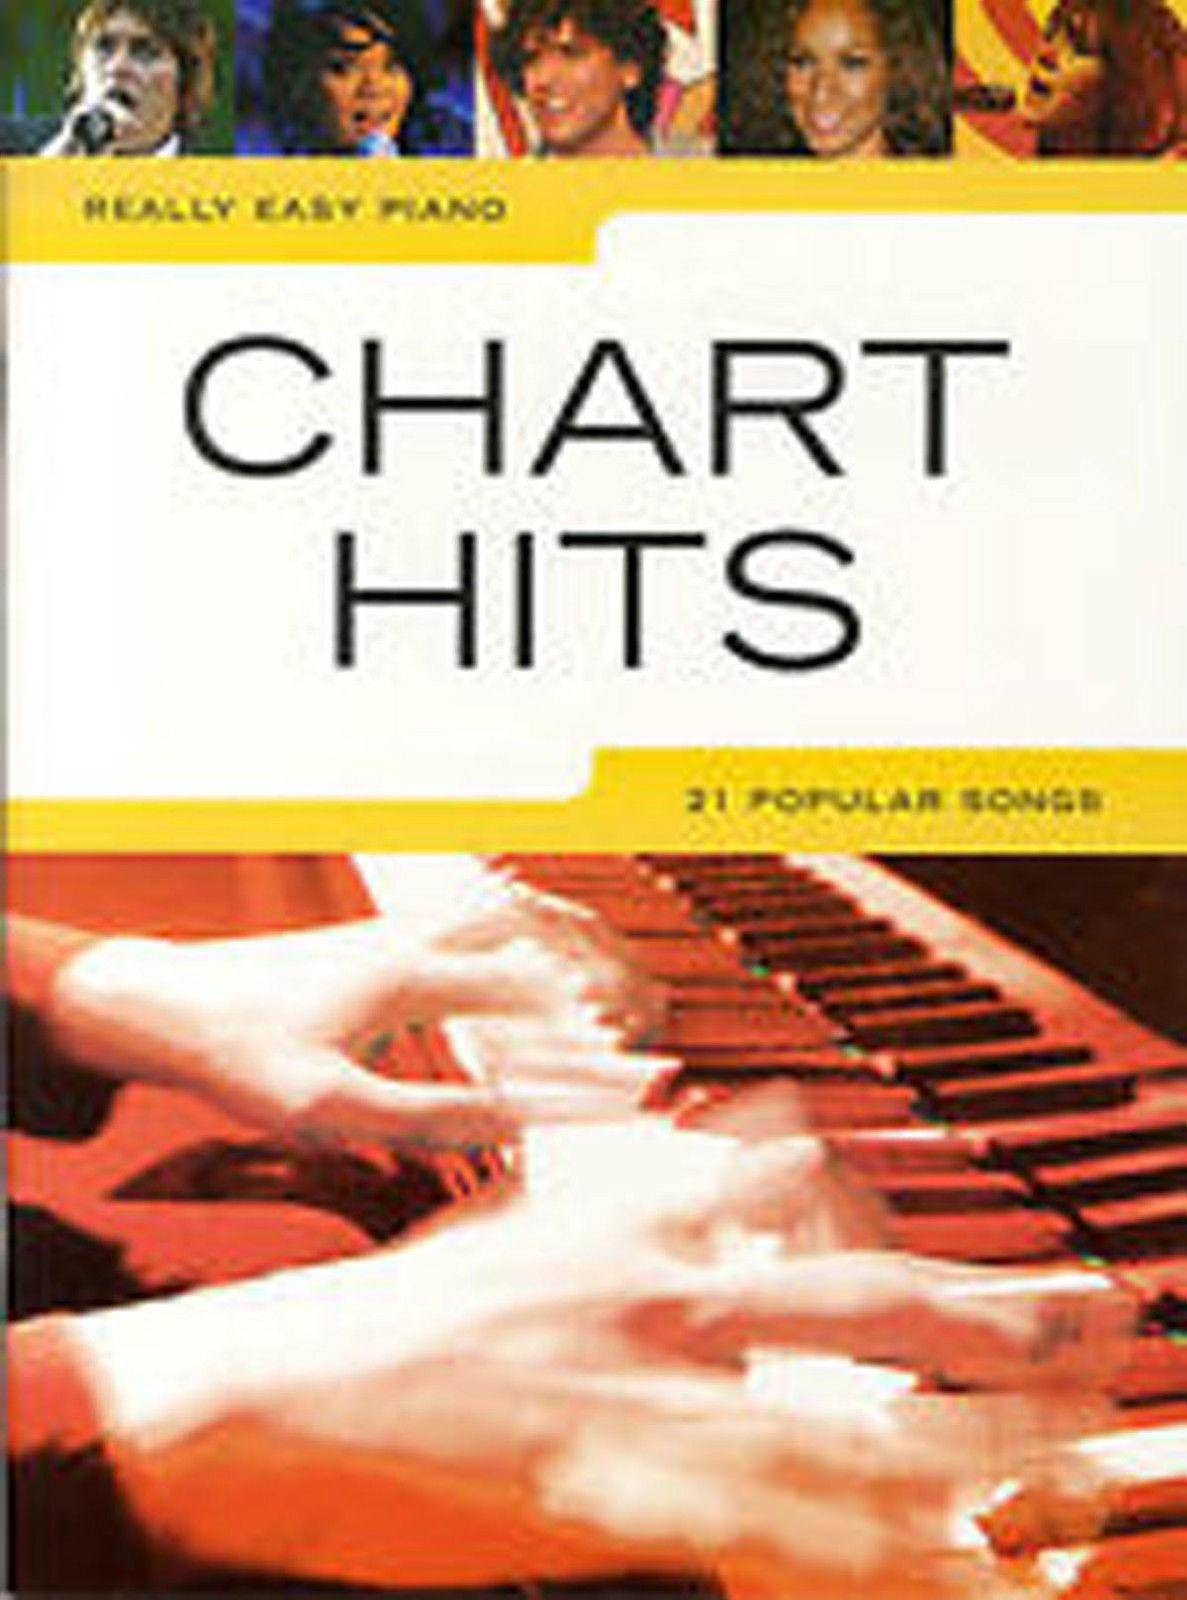 Really Easy Piano Chart Hits Sheet Music Book Leona Lewis  McFly Kate Nash B29